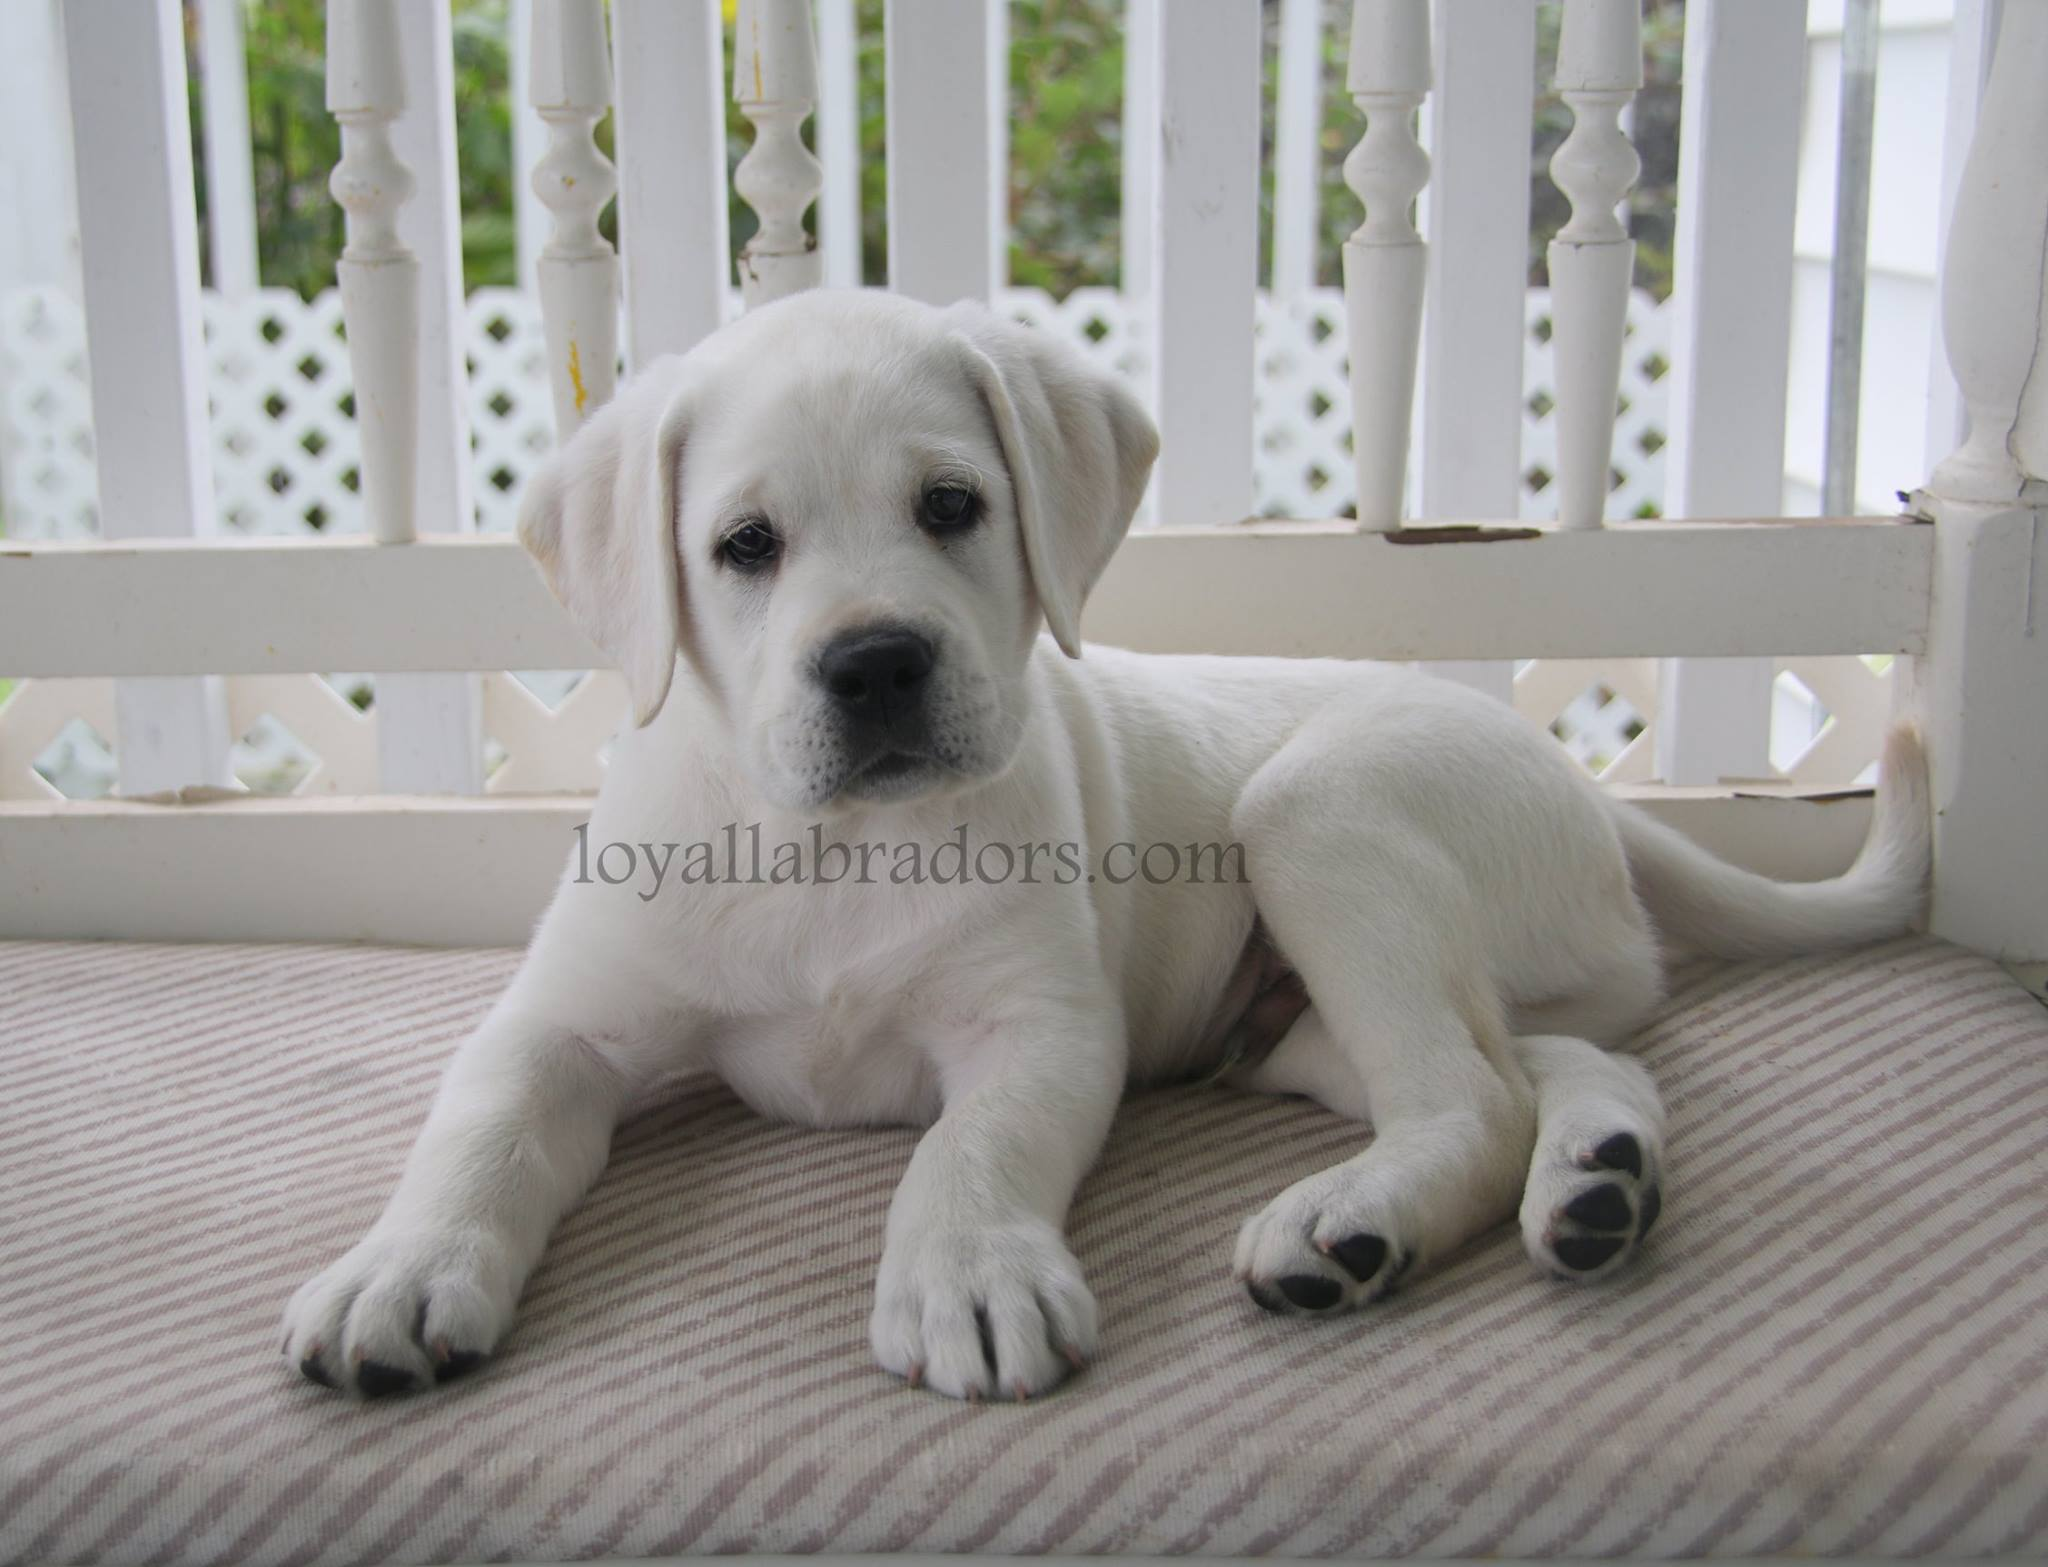 White Lab Puppies And White English Labrador Retrievers Puppies Snow